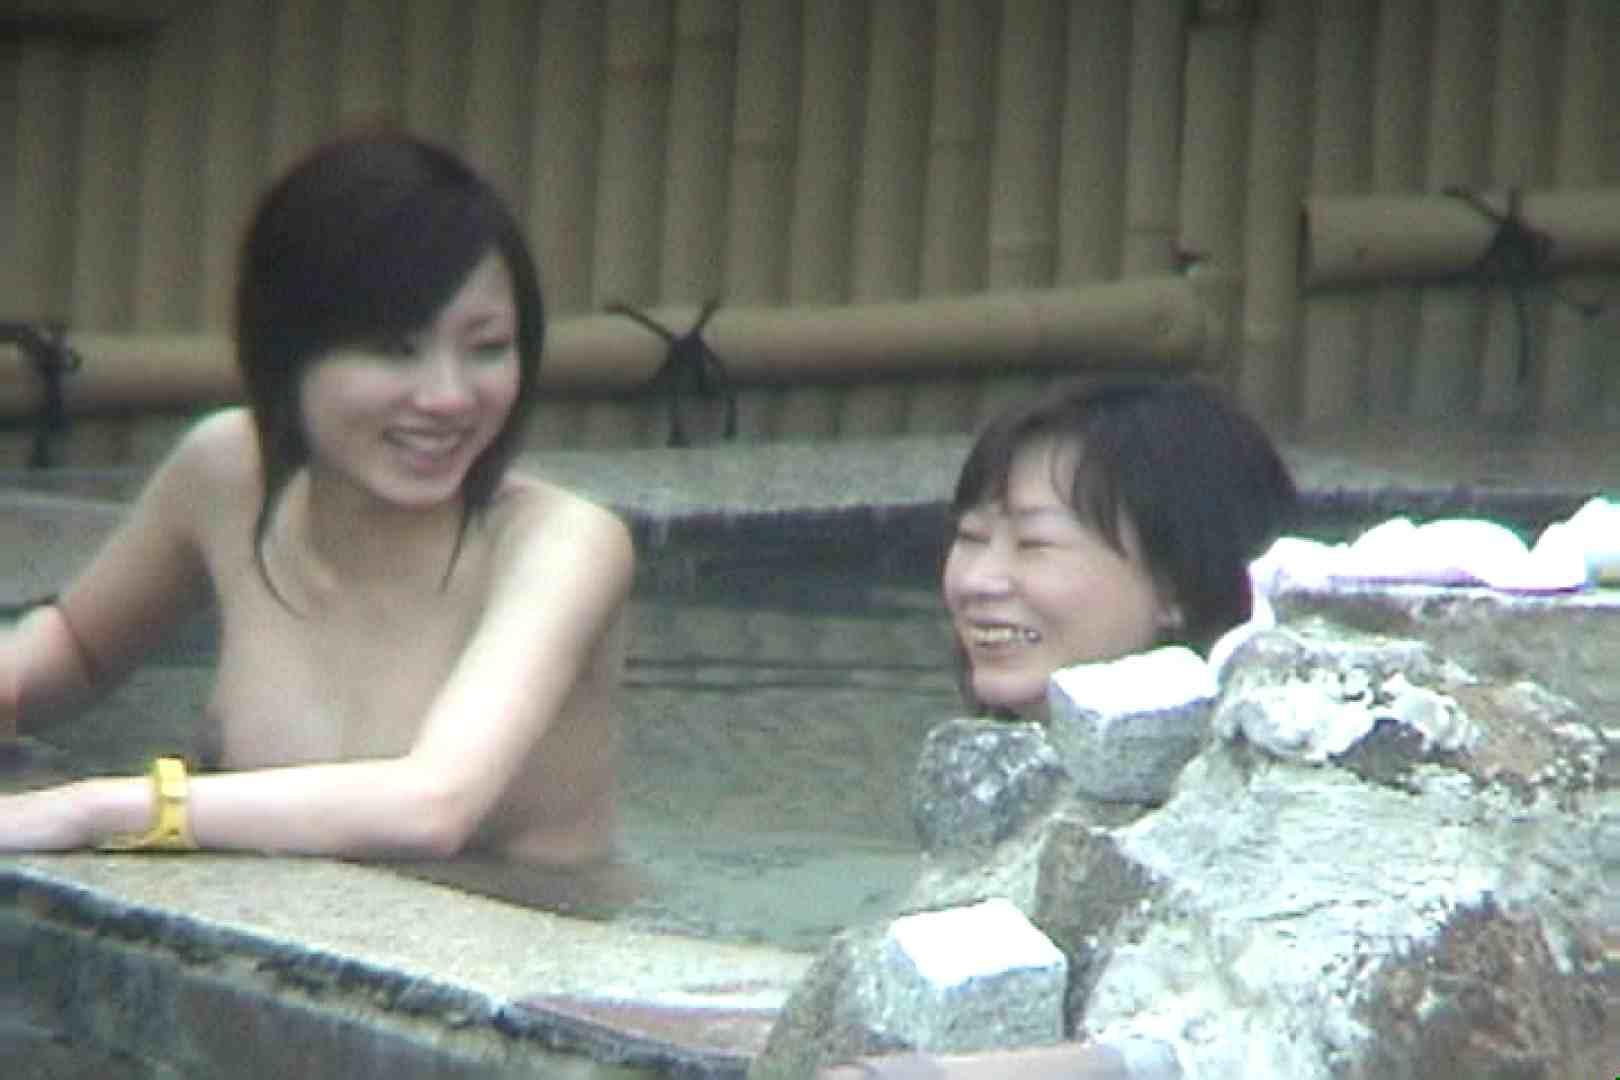 Aquaな露天風呂Vol.58【VIP限定】 露天風呂突入 盗撮動画紹介 97pic 41